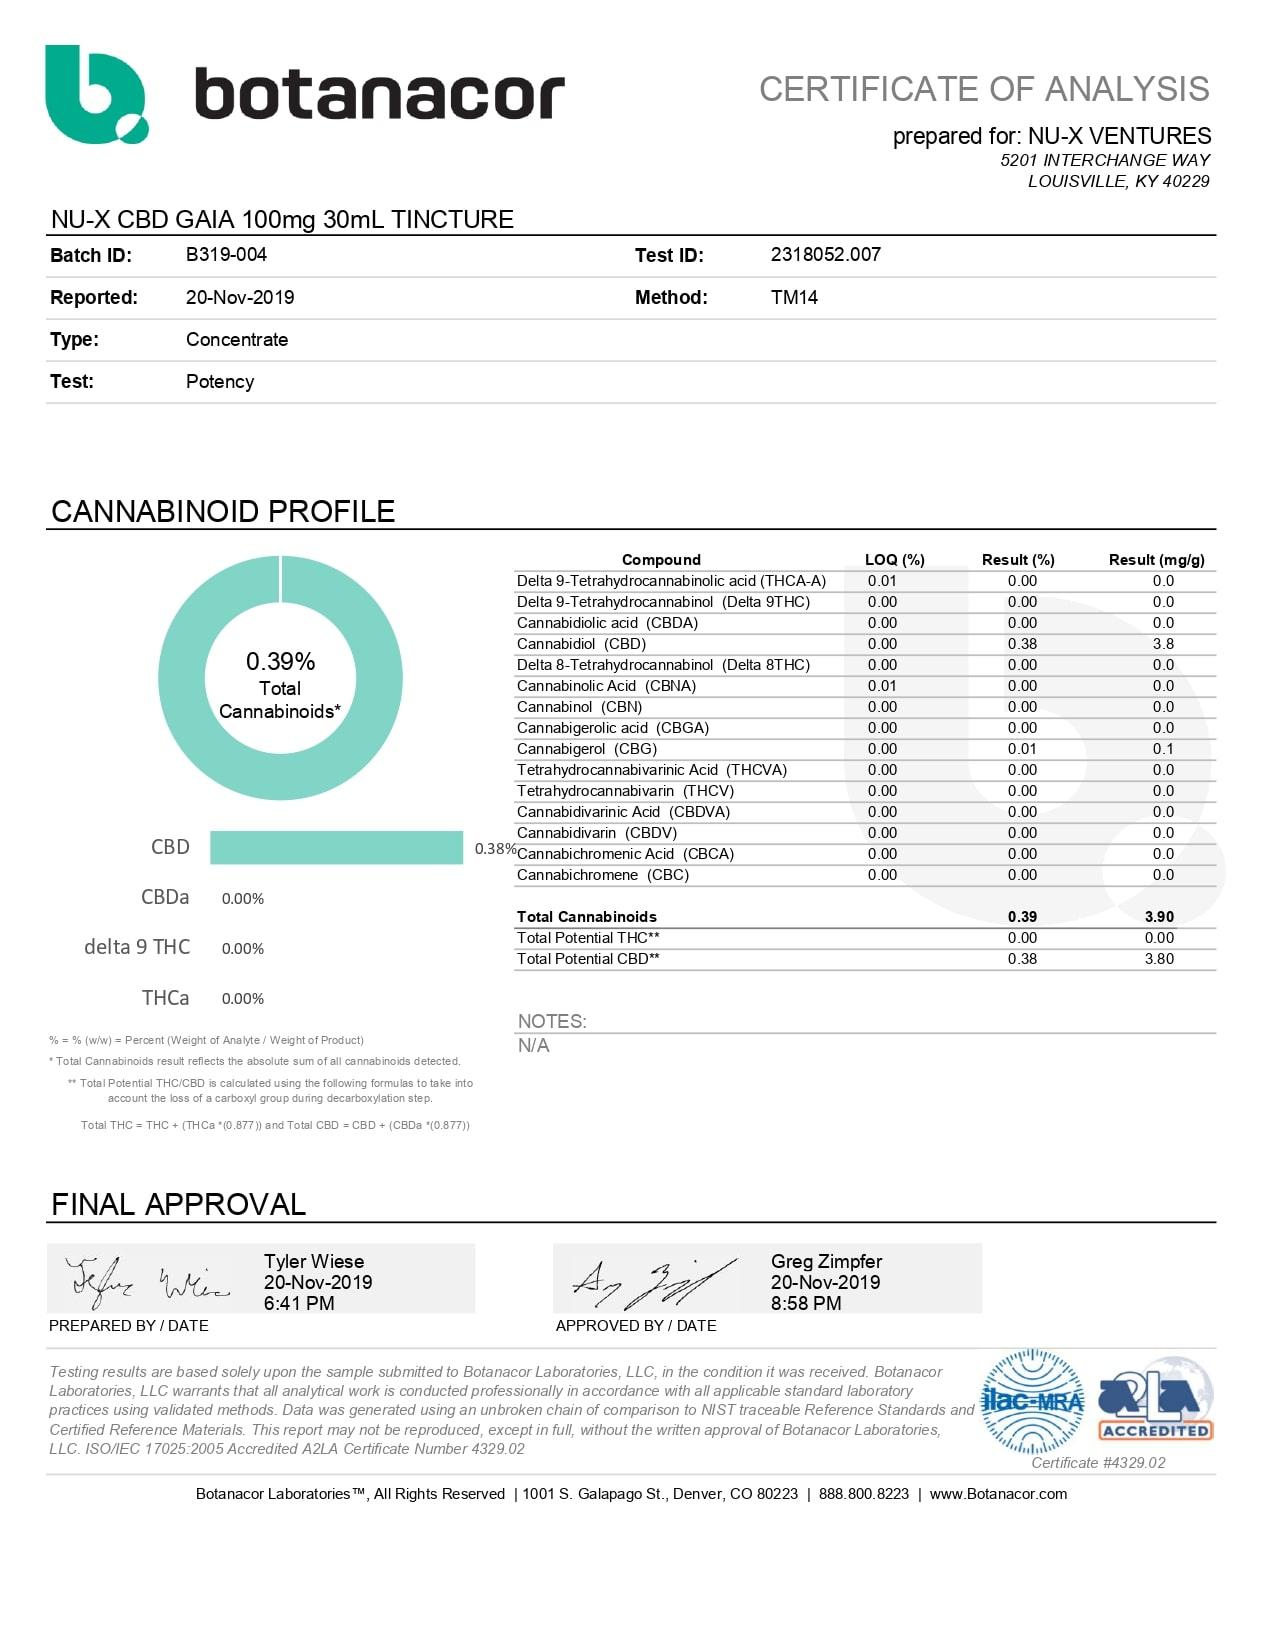 NU-X CBD Tincture Lab Report Gaia Pina Colada Coconut 100mg